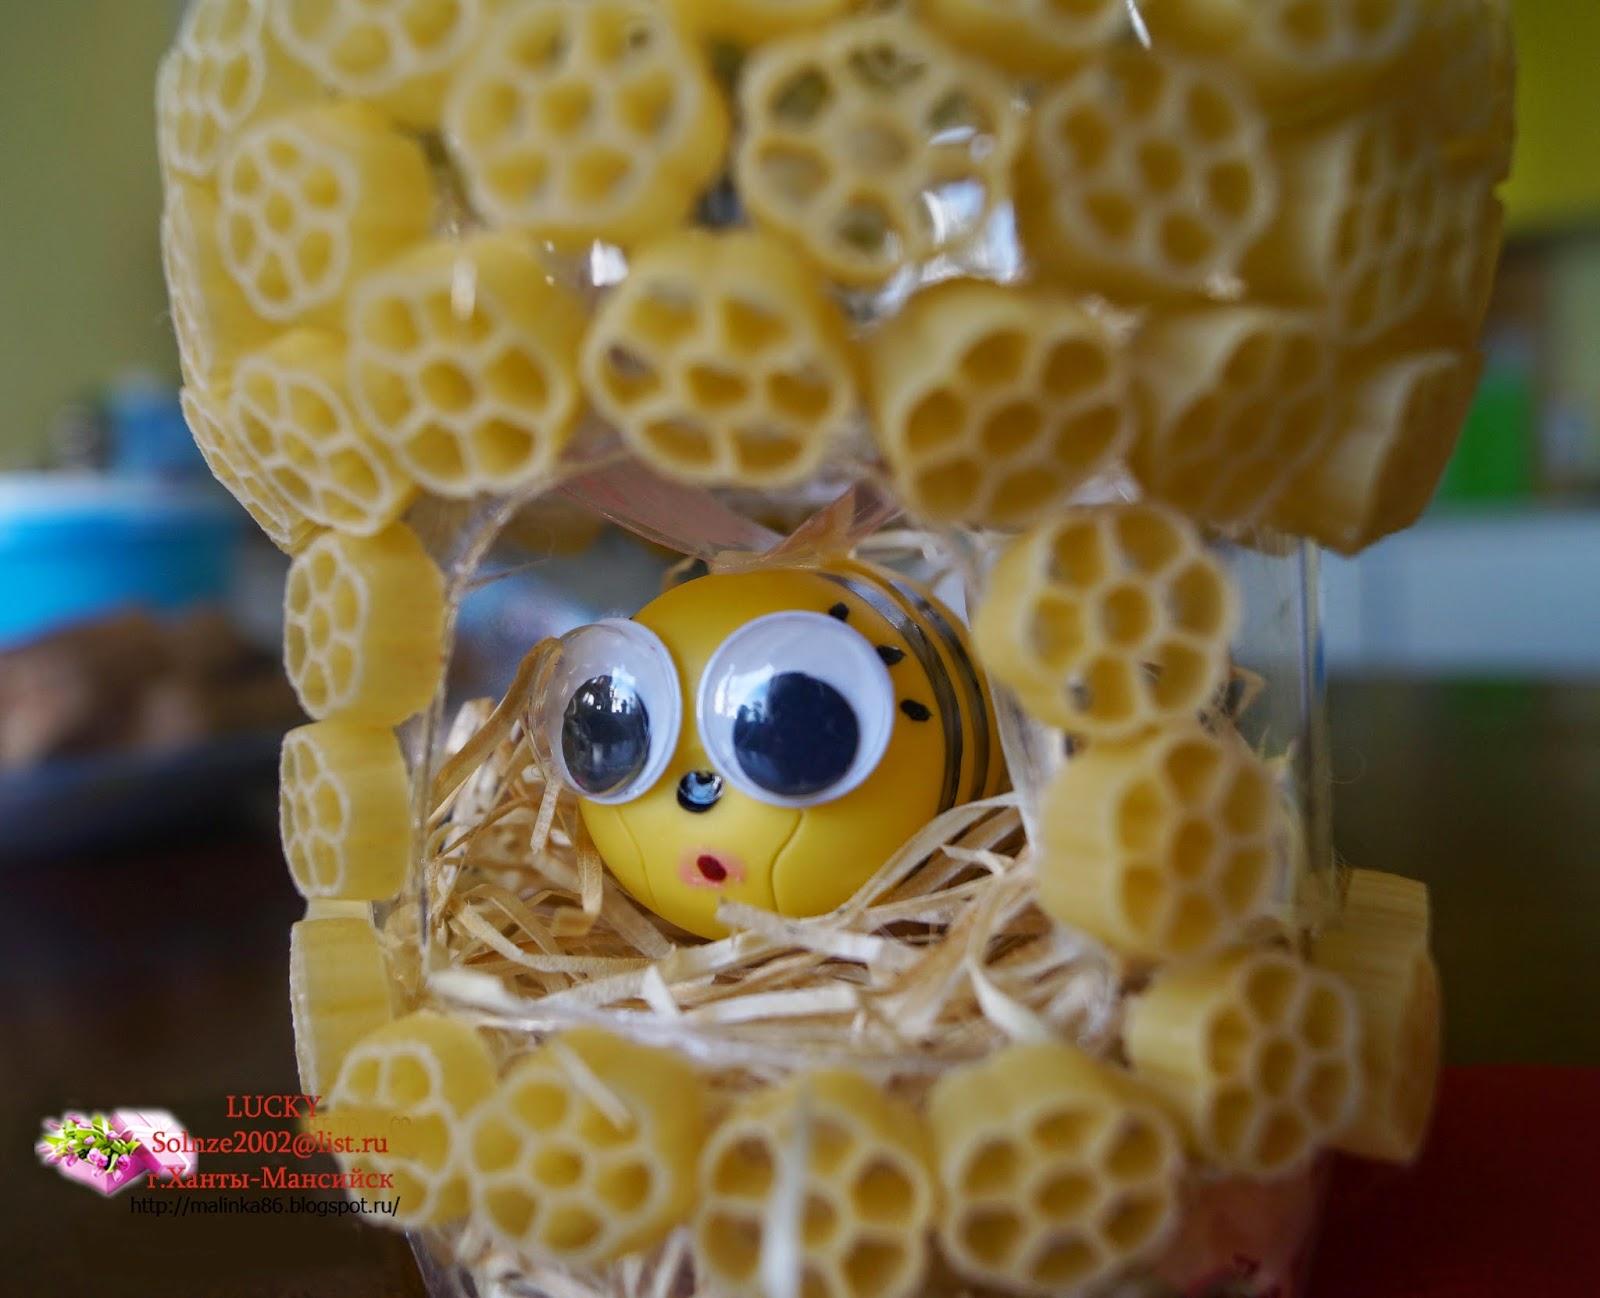 Пчелка из киндер сюрприза своими руками